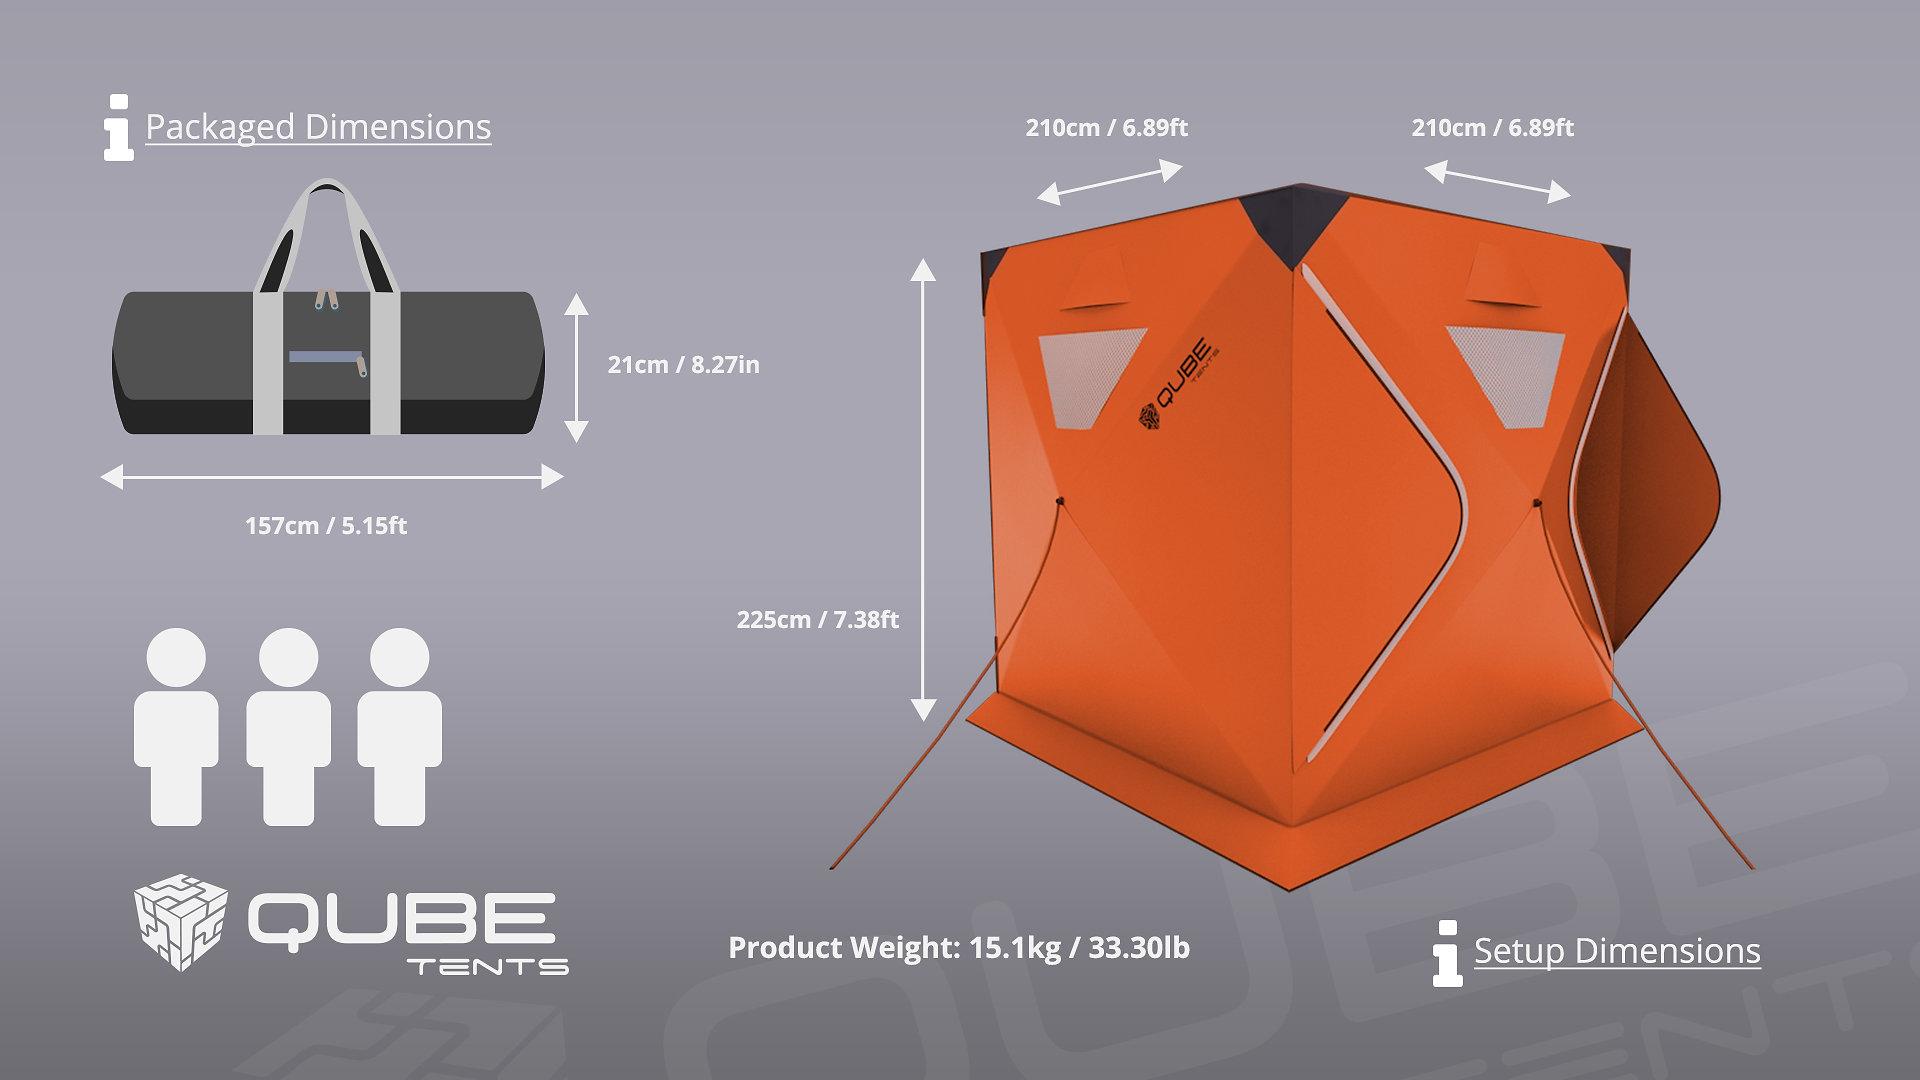 ic8llcyzpis7zlbiaieo, Qube tents, indiegogo, quick tents